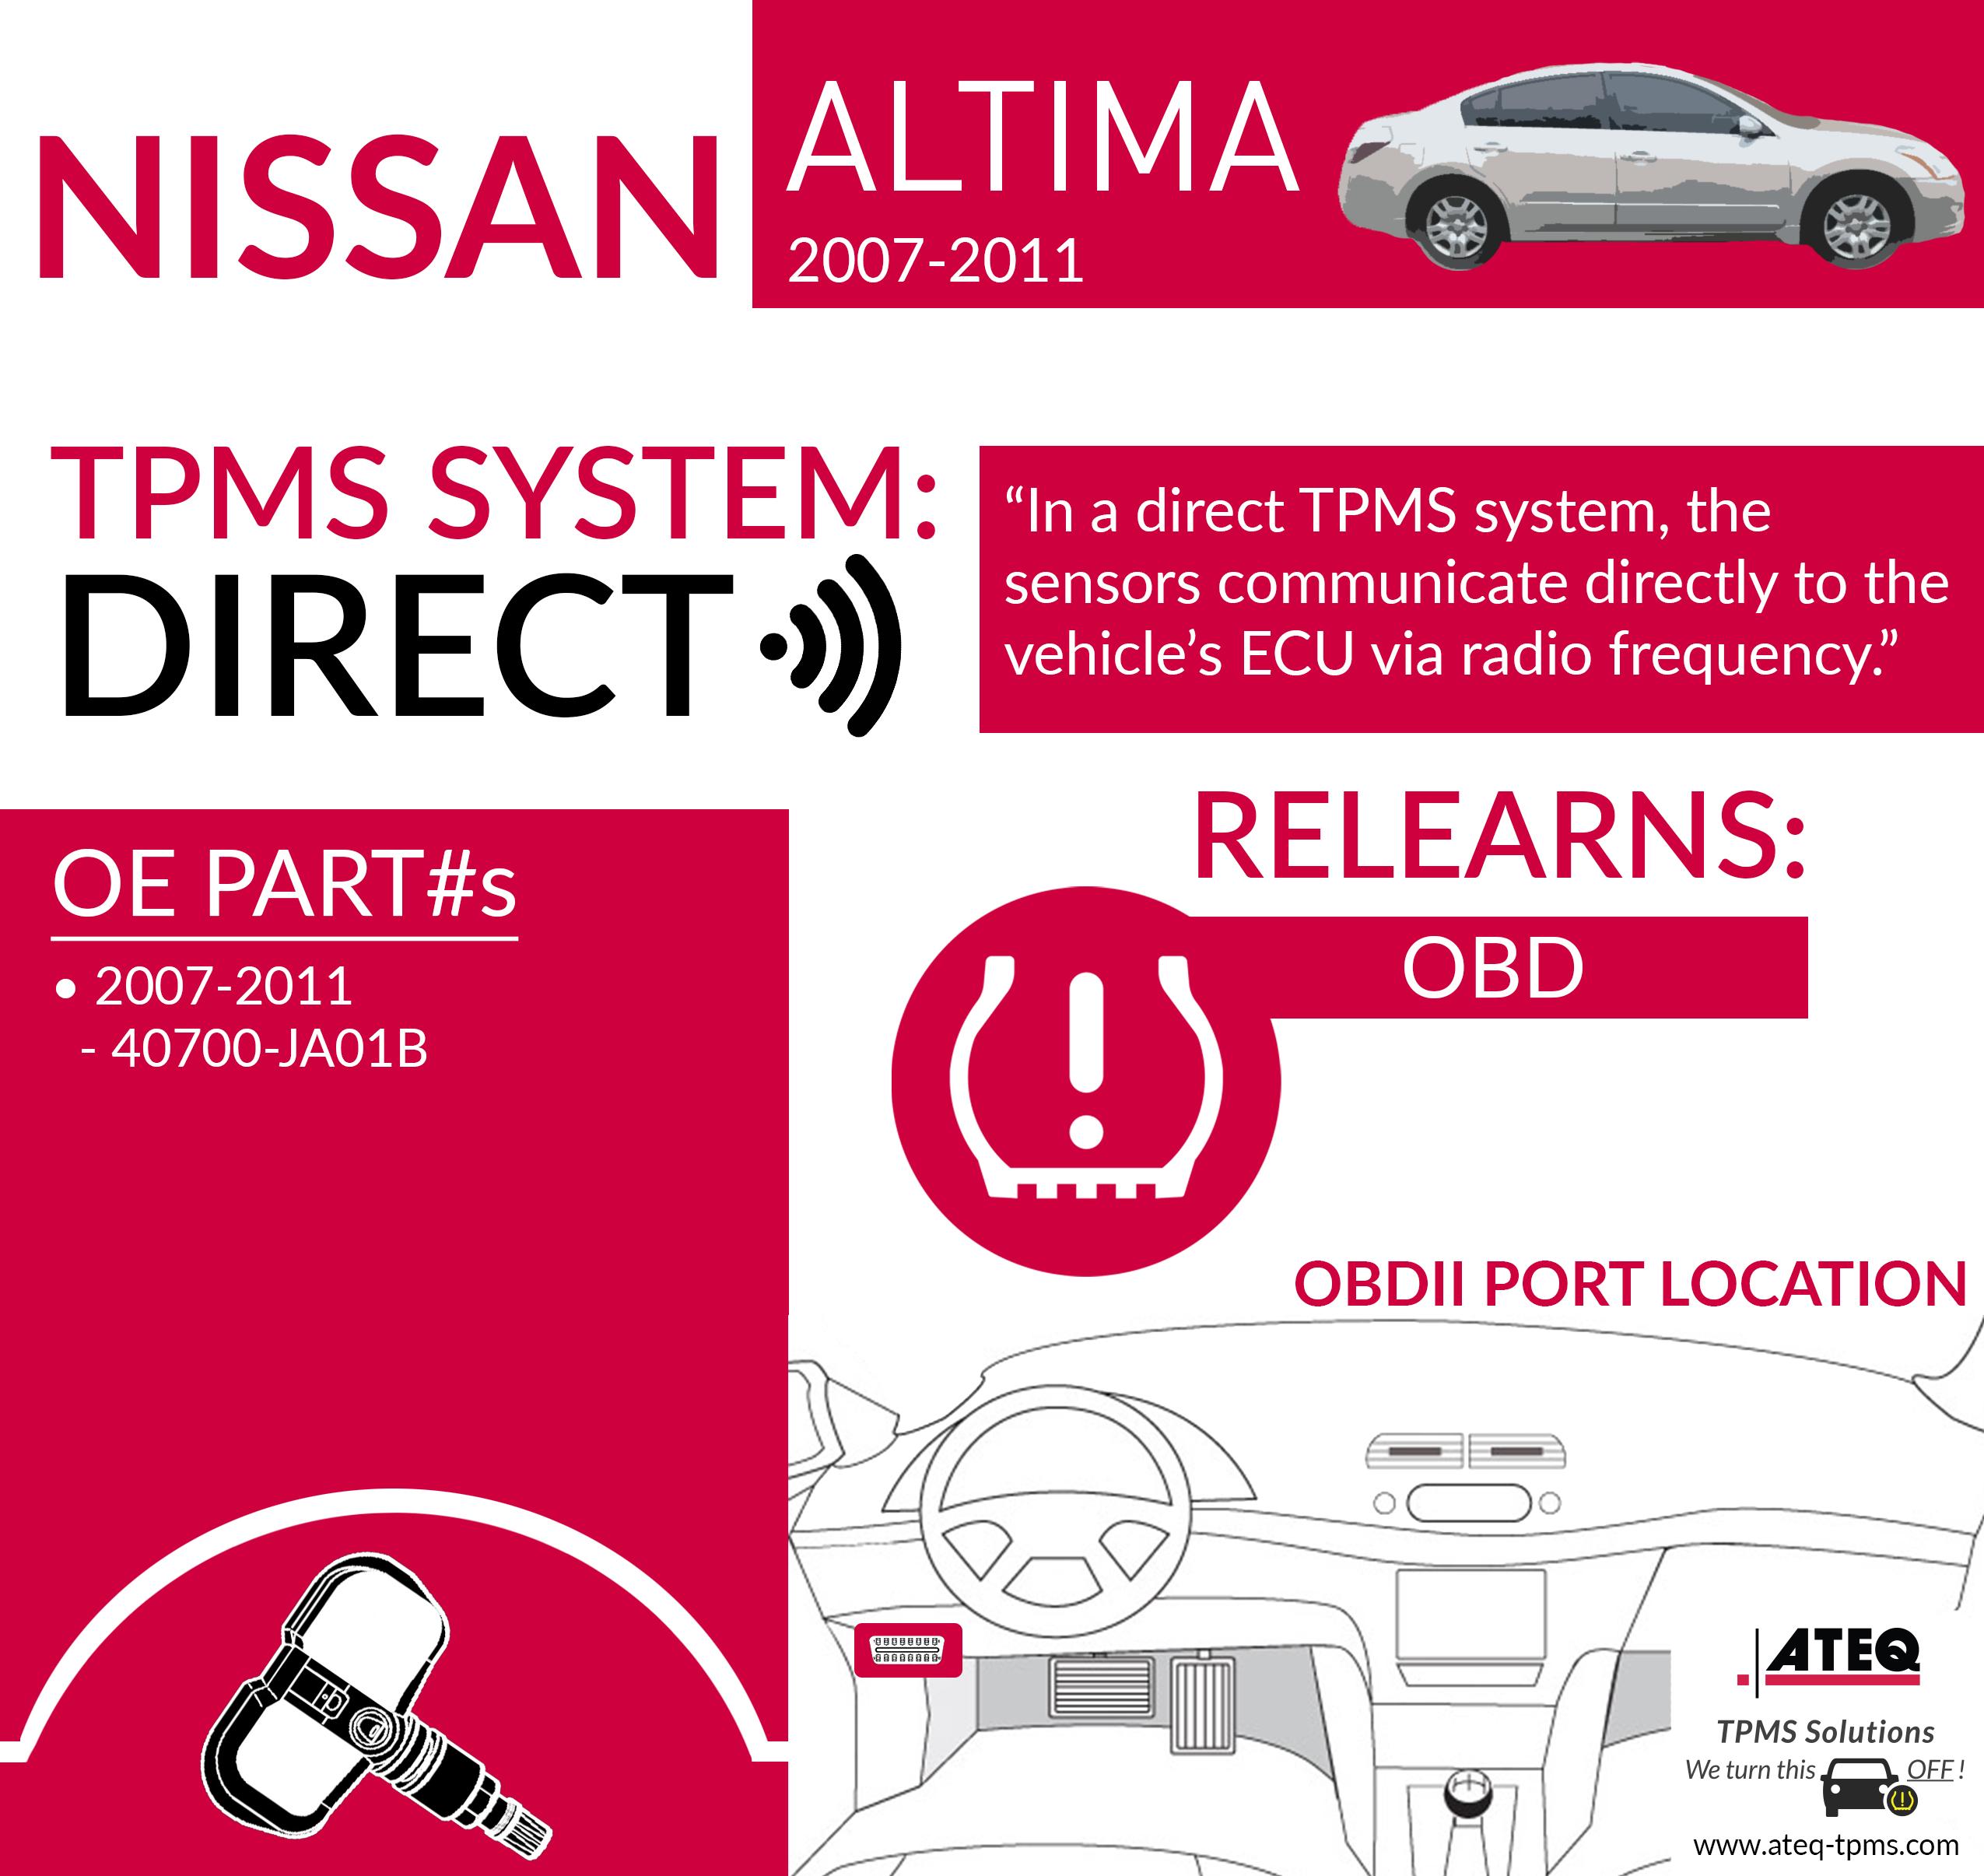 Nissan Altima Infographic